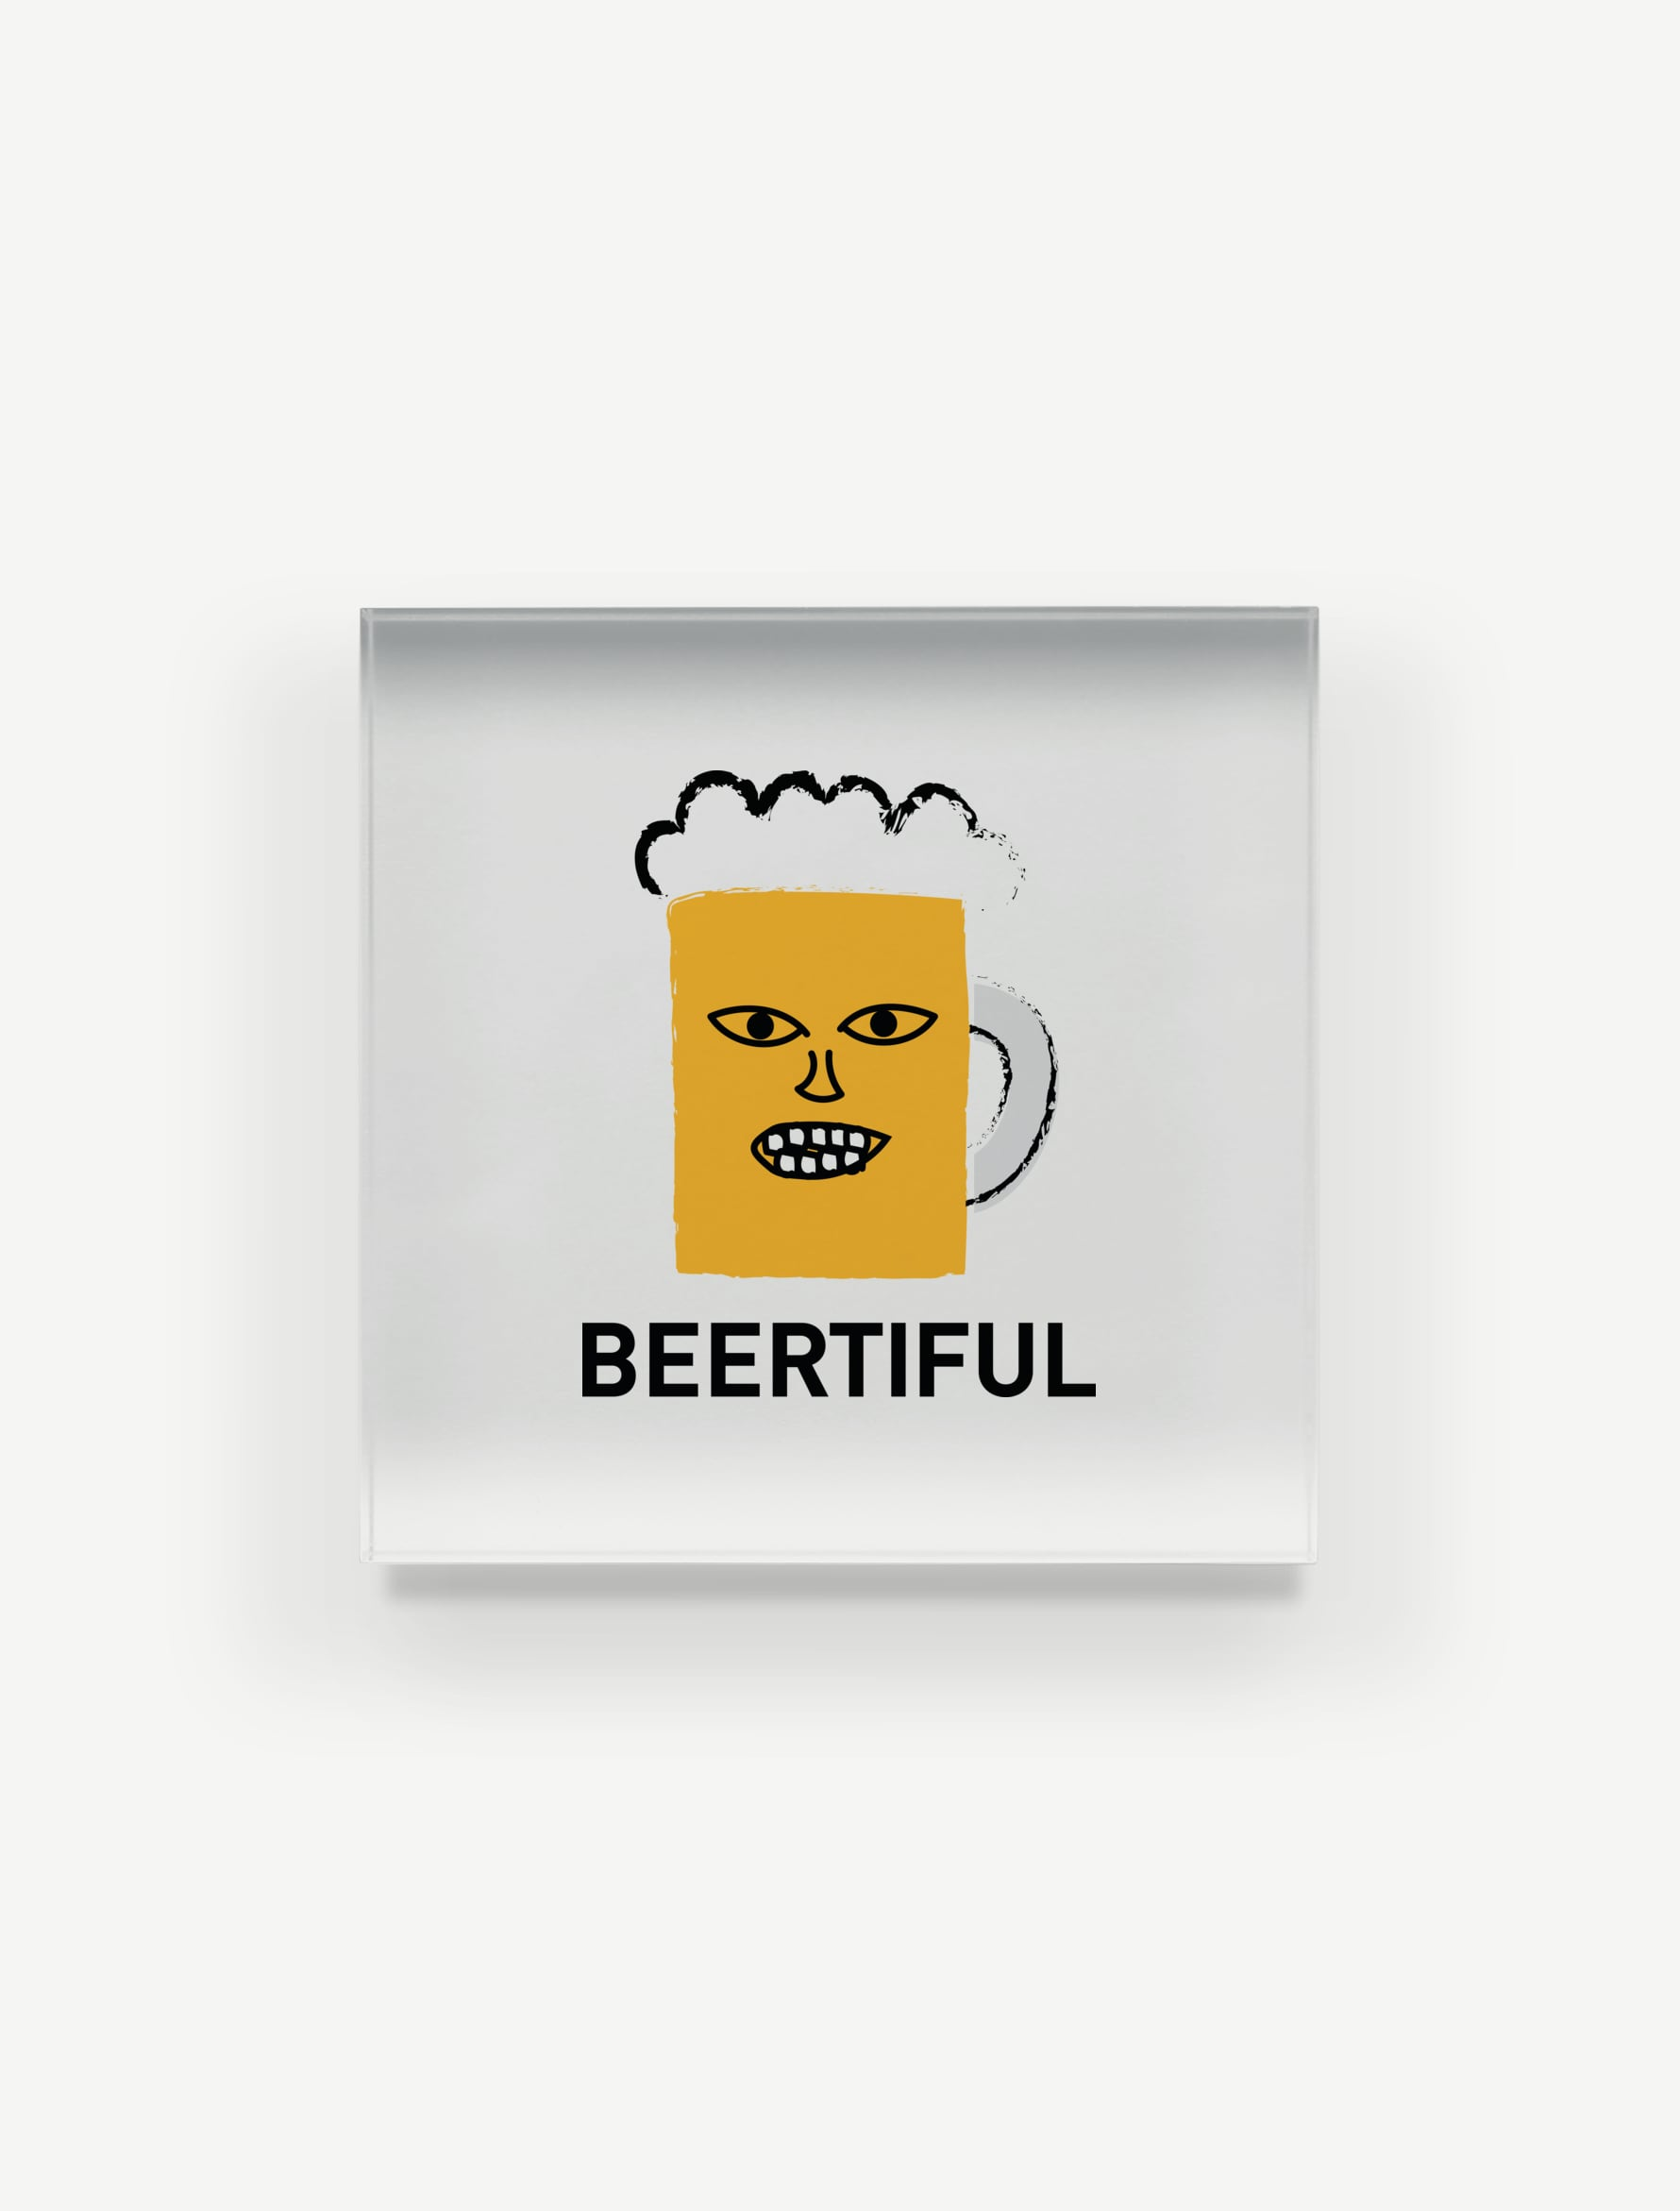 【BEERMAN】アクリルブロック